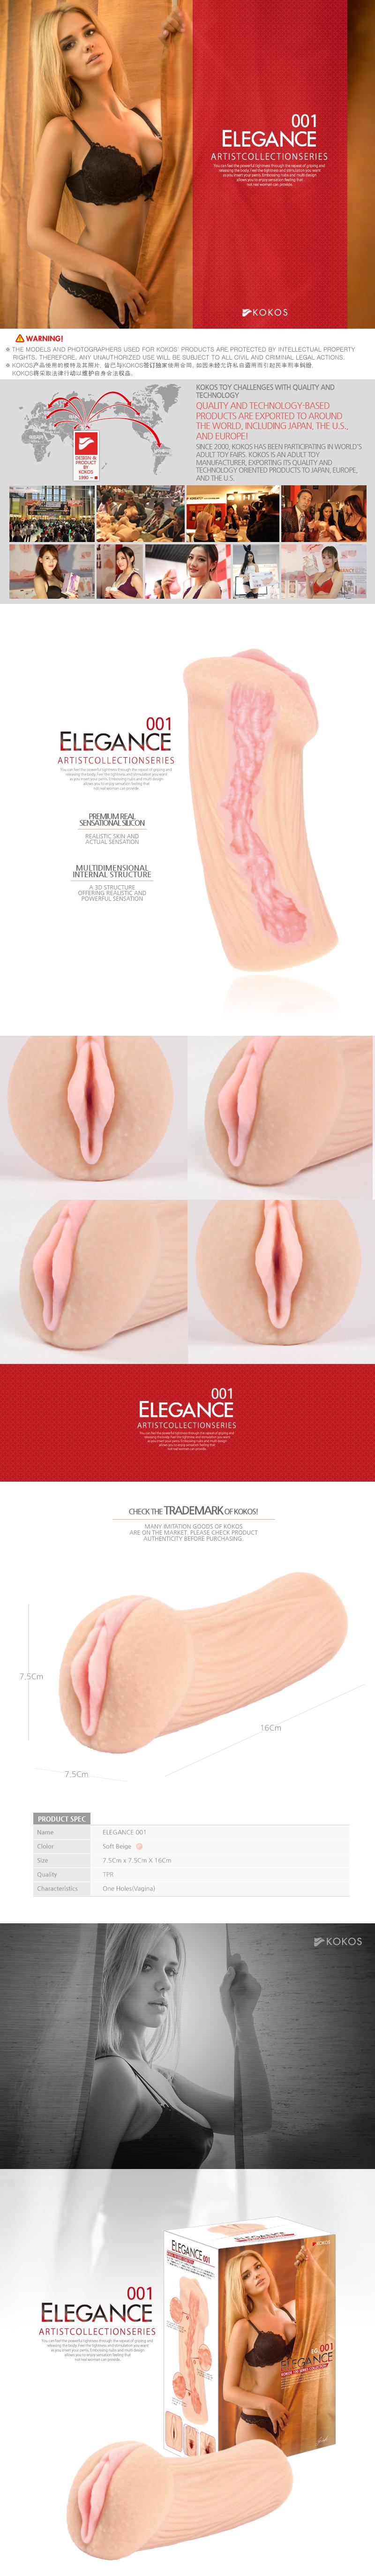 Elegance 001